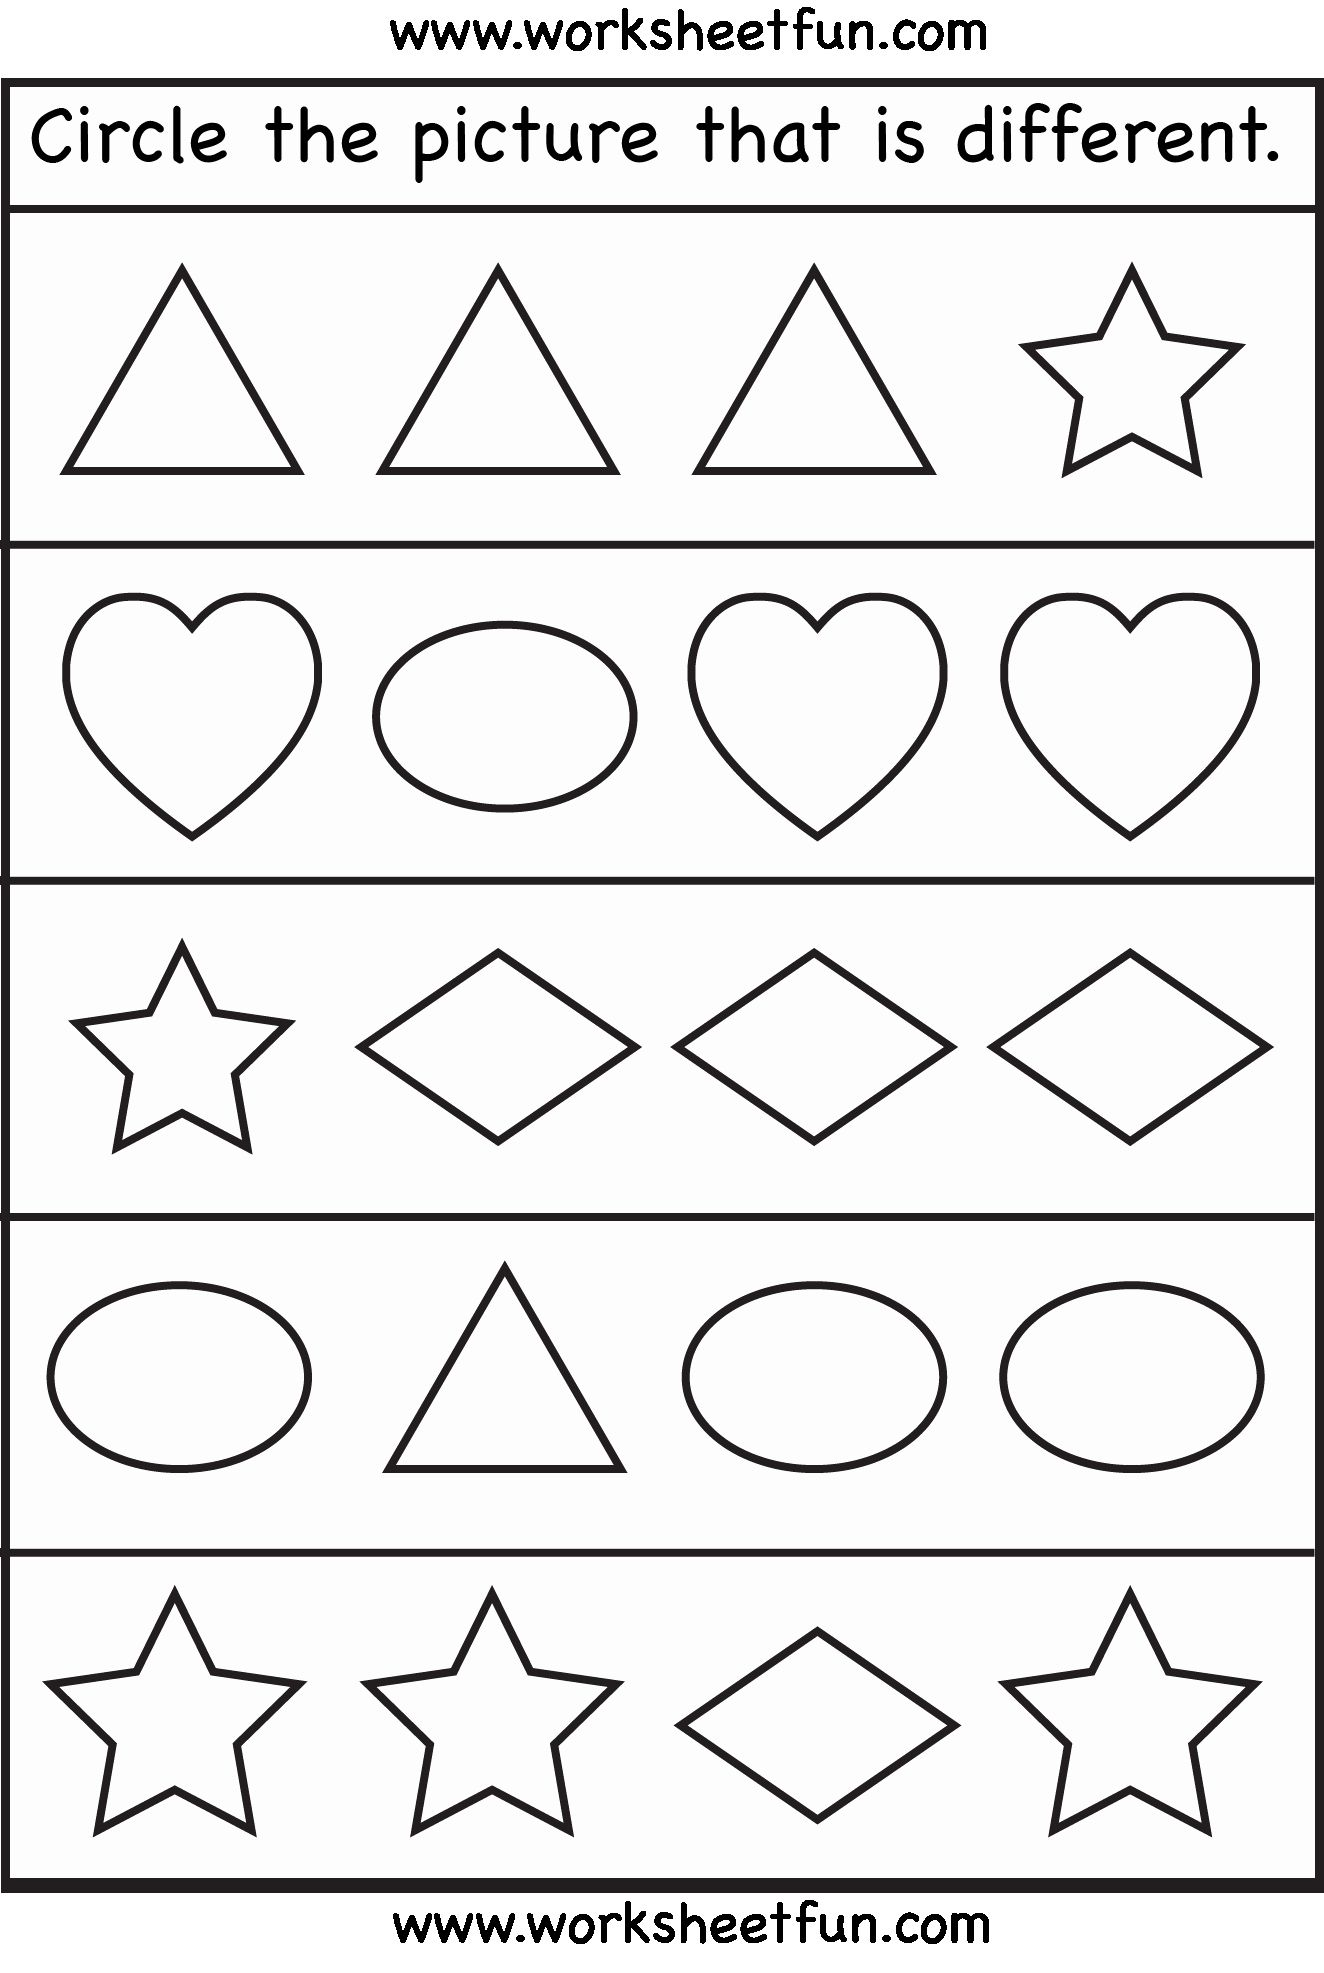 Same Or Different Worksheets Preschool In